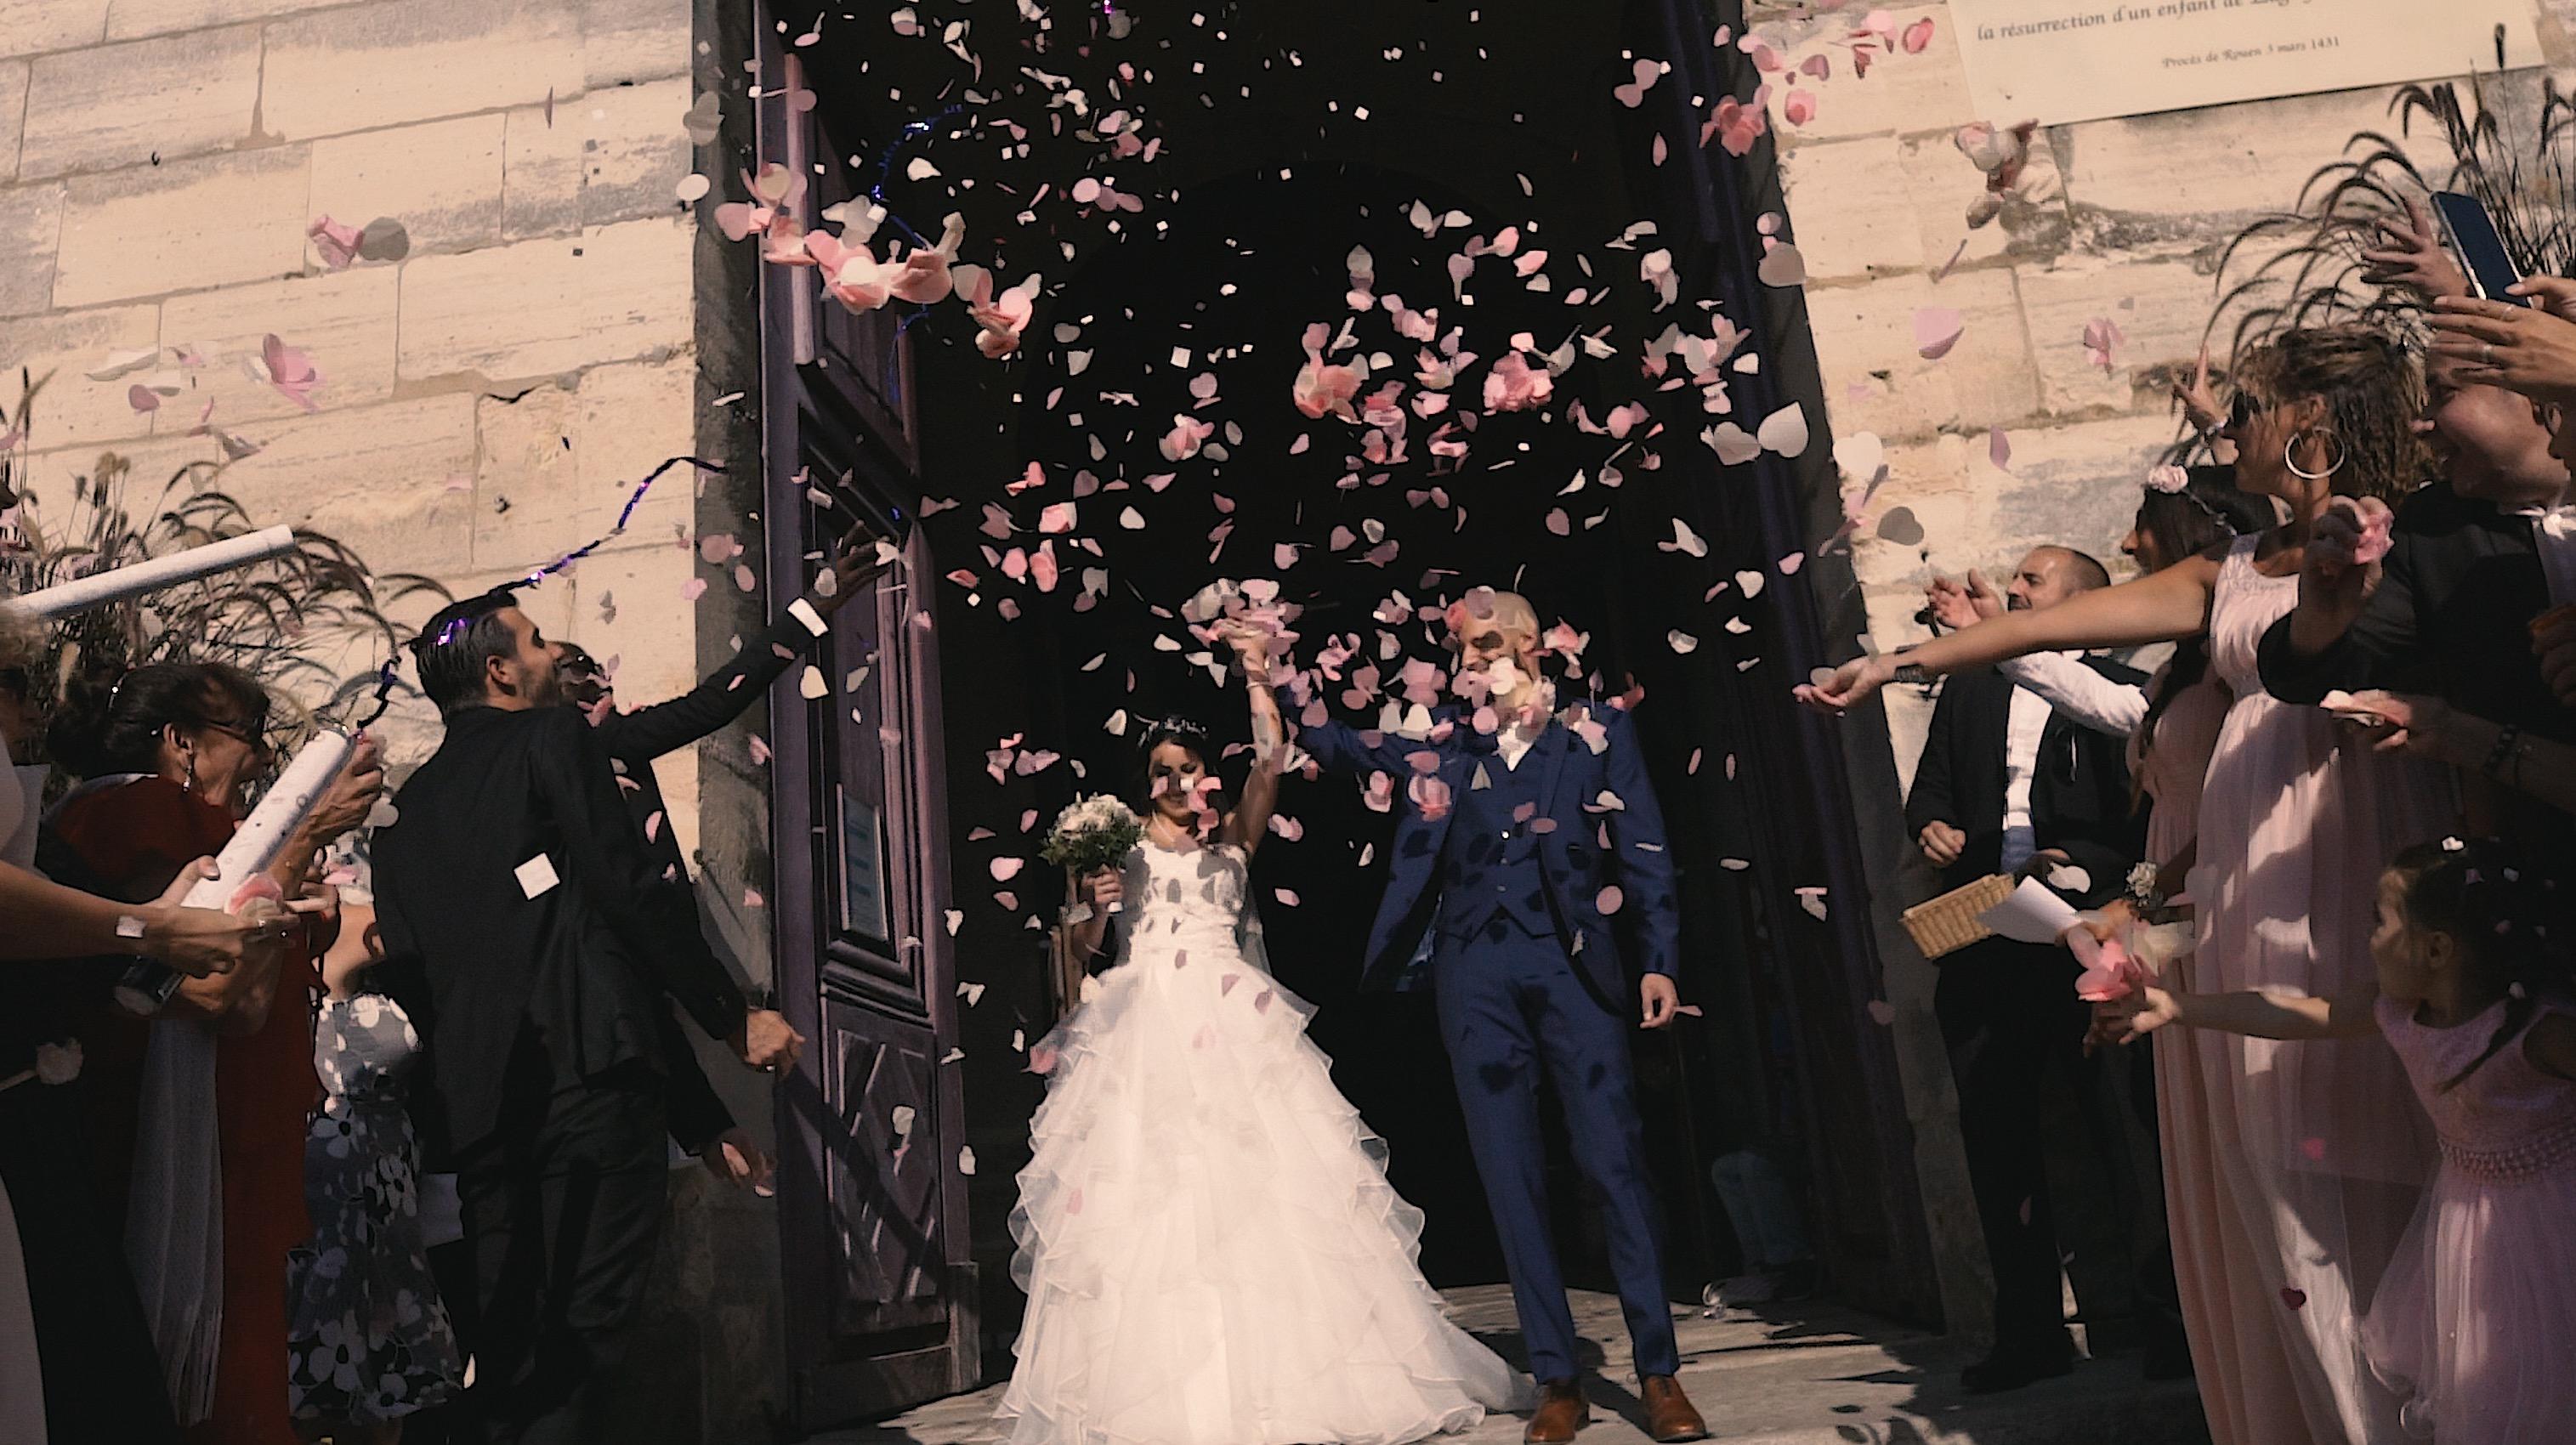 videomariage, vidéomariage, filmdemariage, filmmarié, vidéastemariage, mariagesouvenir, dronemariage, vueaeriennemariage, organisationmariage, mariageorga, photographemariage, mariages, instamariage, photodemariage, inspirationmariage, mariagefreres, mariagepourtous, mariageoriental, decomariage, mariageprovence, blogmariage, papeteriemariage, mariageparfait, kamariage, lemariage, salondumariage, organisationmariage, mariagevintage, fairepartmariage, coiffuremariage, fleuristemariage, beautémarié, miseenbeauté, maquillage mariage, maquilleuseprofessionellemariage, wedding, videomariageseineetmarne,